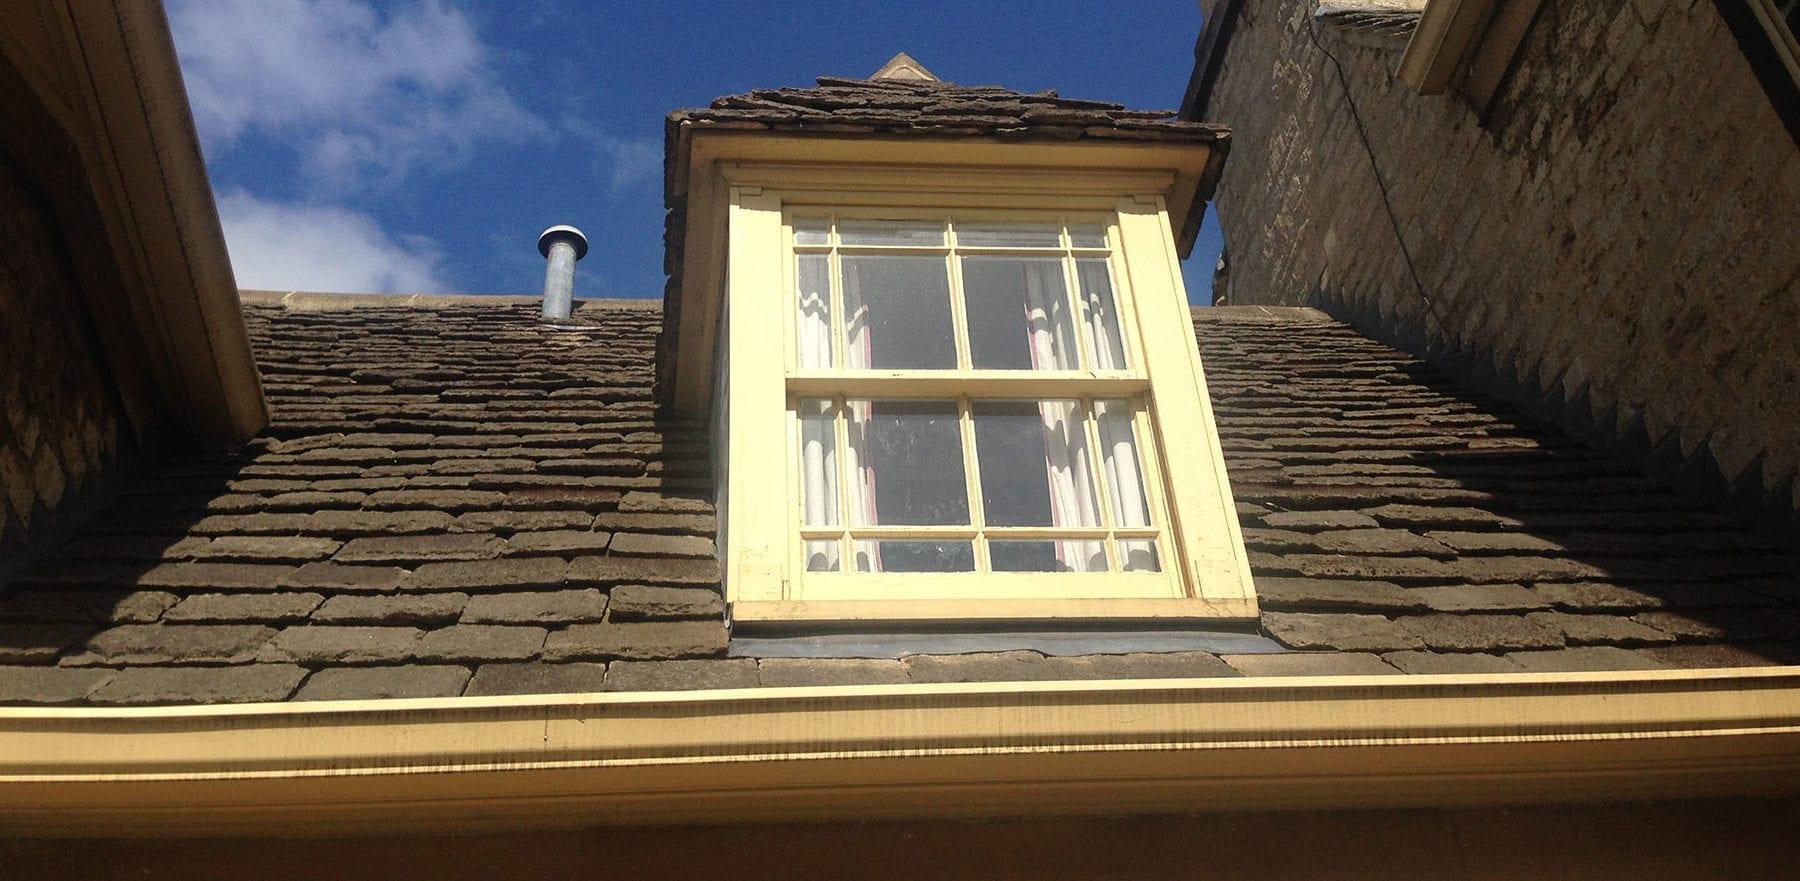 Lifestiles - Natural Stone Aged Roof Tiles - Oxford University, England 3